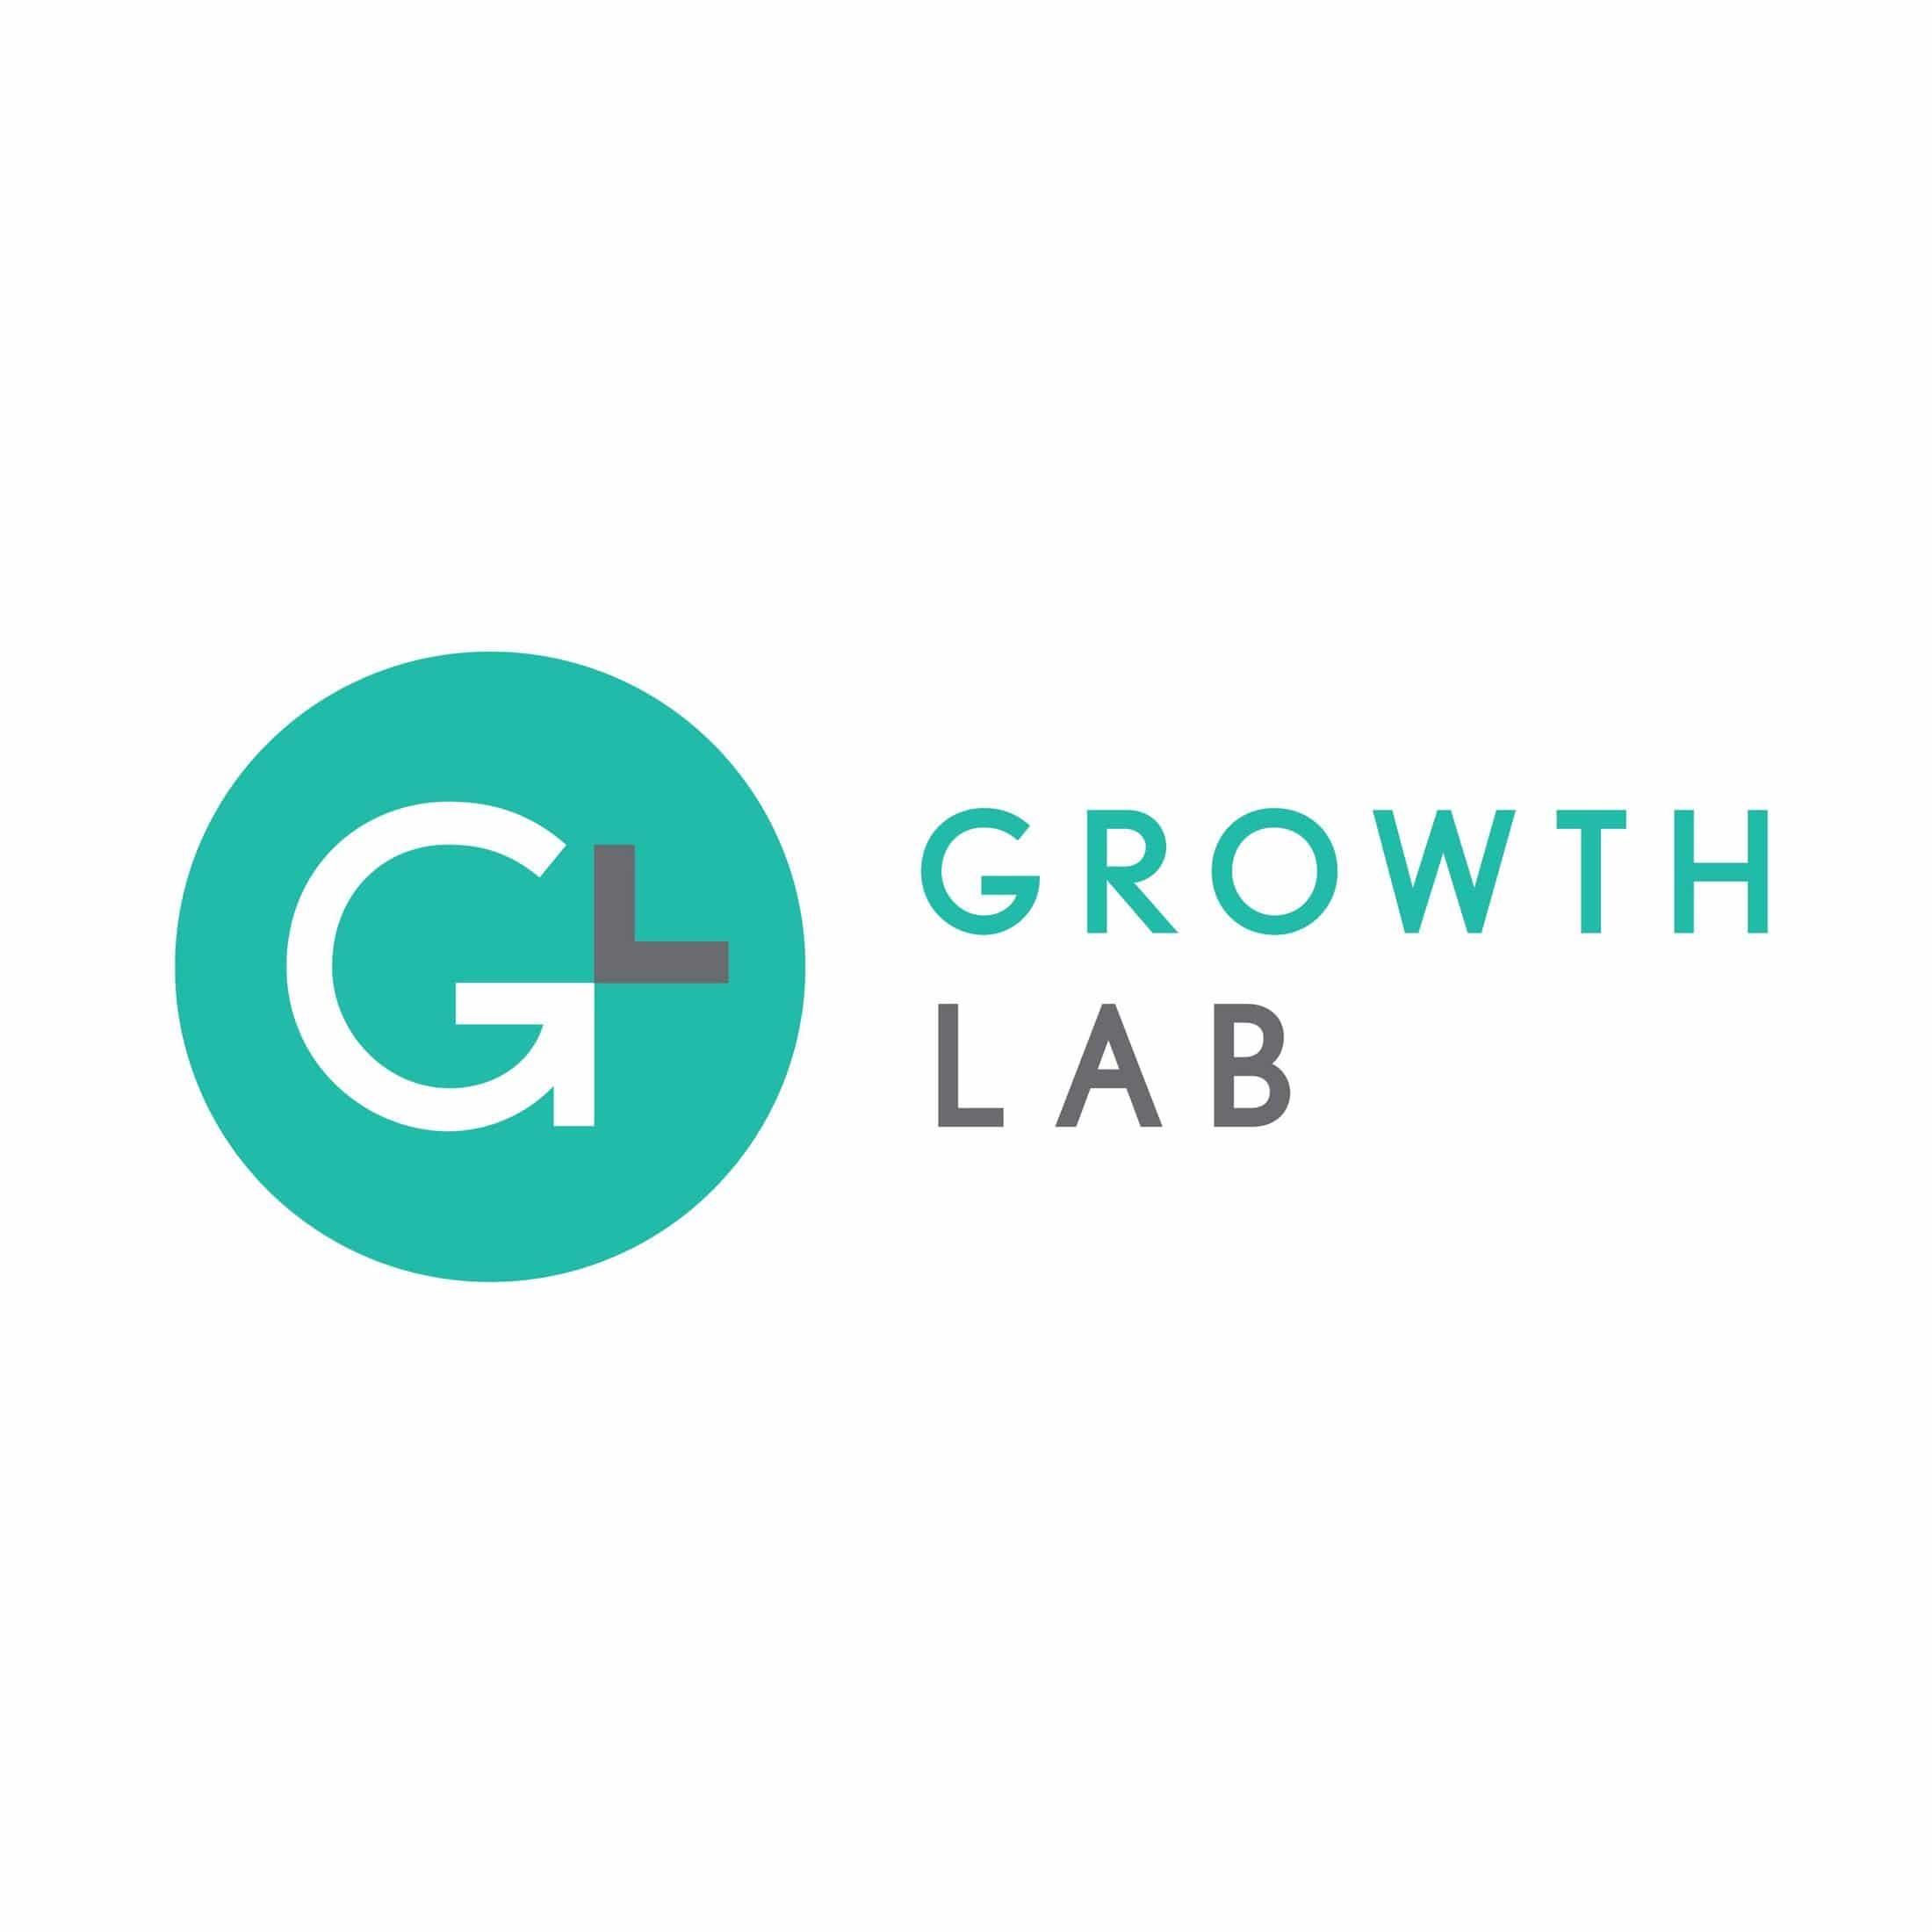 GrowthLab-Logo-studio-issa